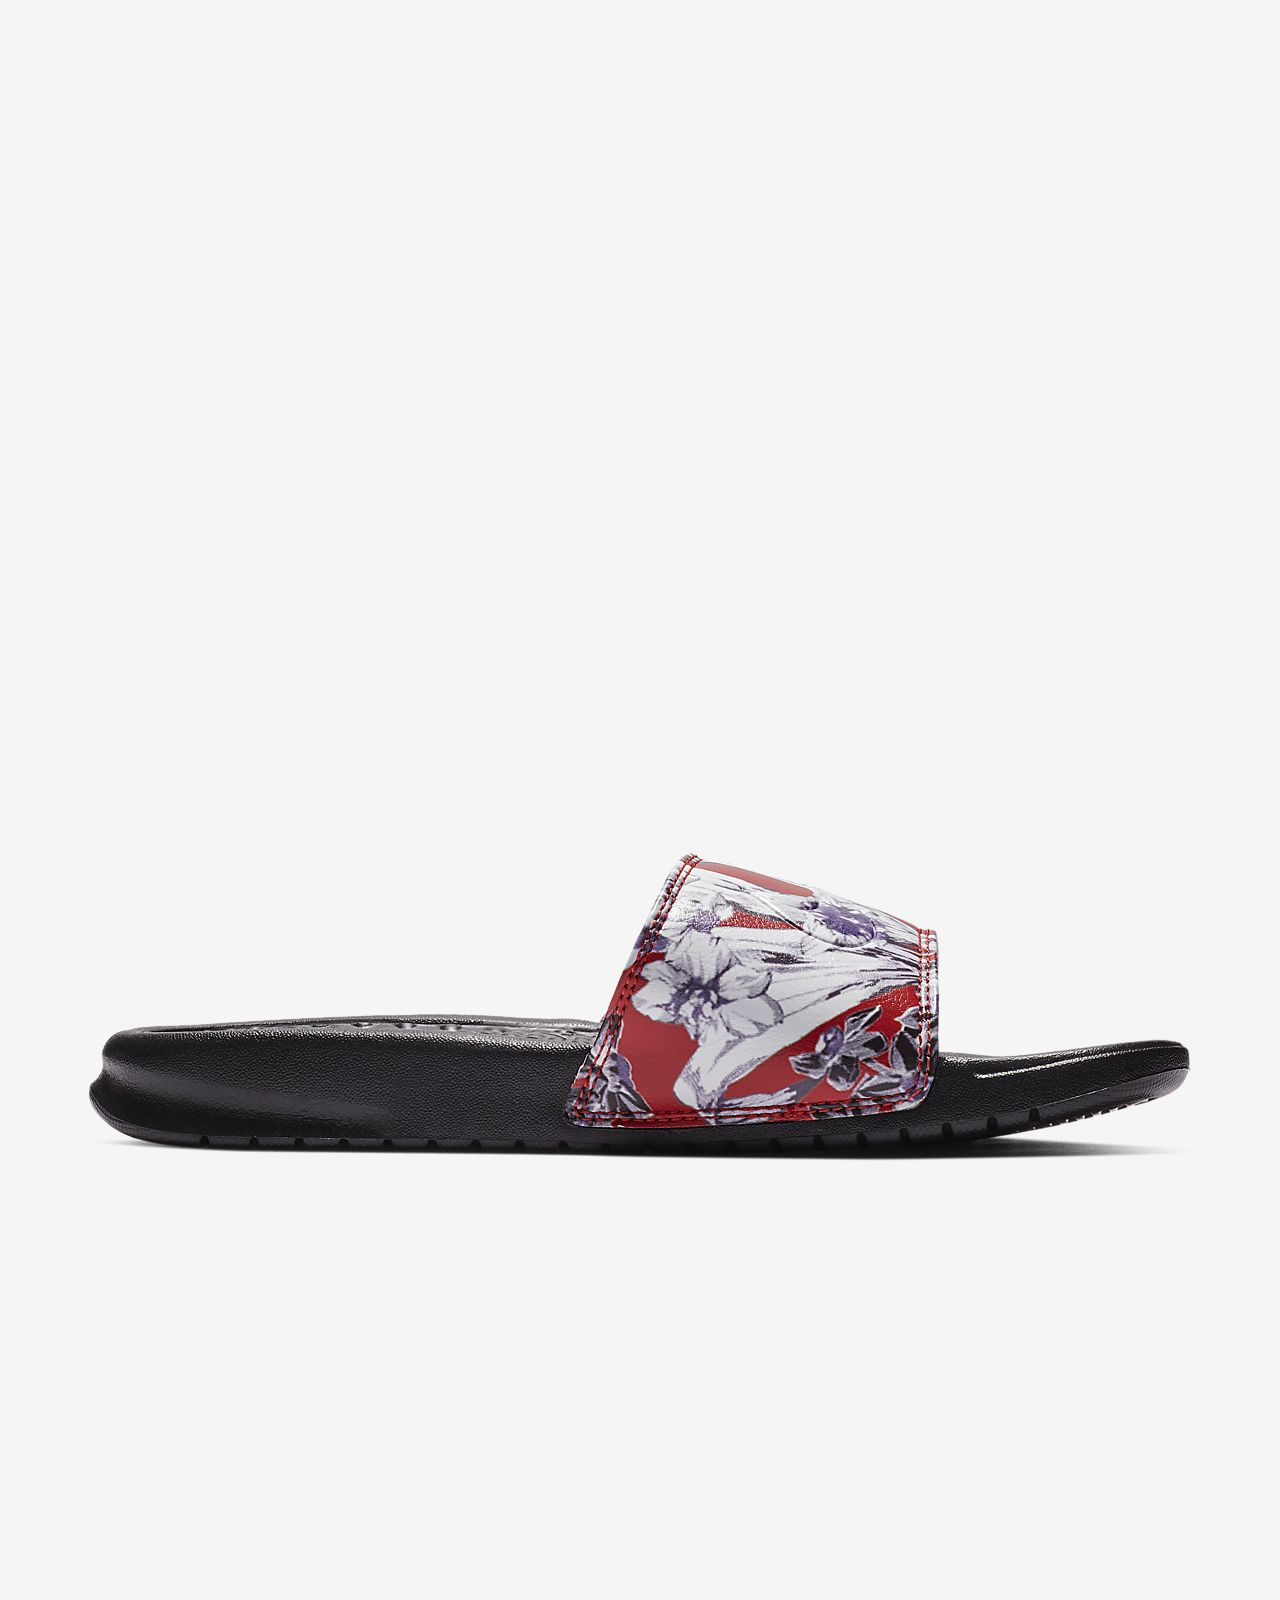 b655702cb4dc Nike Benassi JDI Floral Women s Slide. Nike.com GB